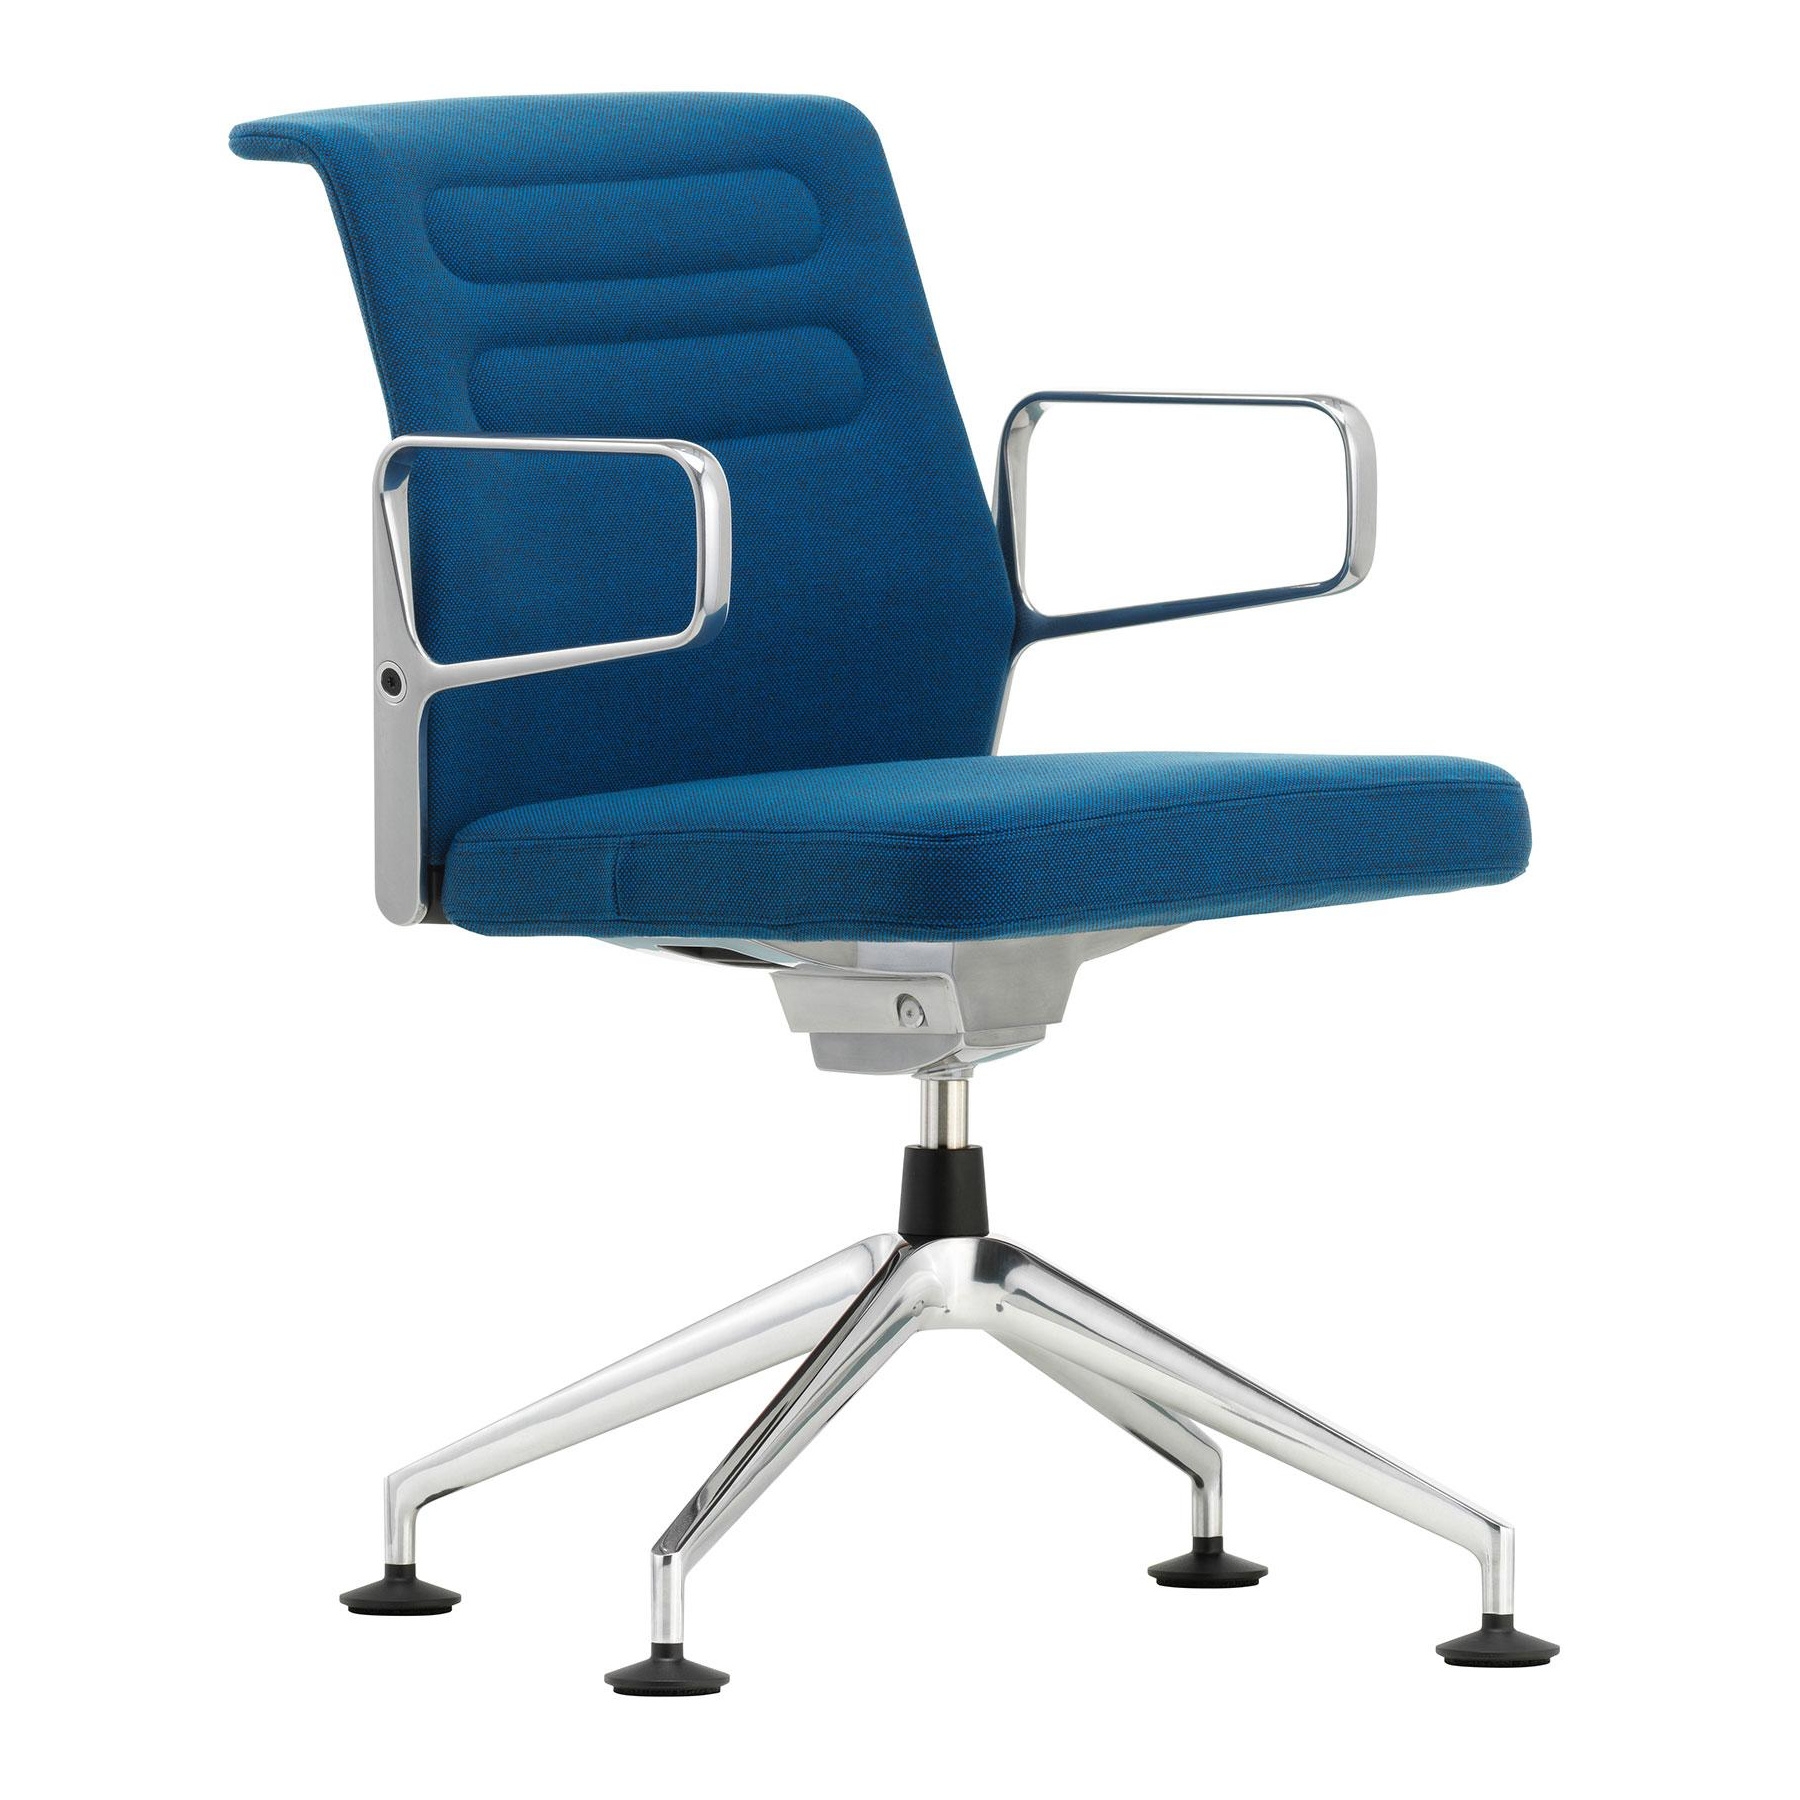 Vitra - AC 5 Meet Konferenzstuhl - blau / moorbraun/Stoff Hopsak 84/BxHxT 74x85x74cm/Gestell Aluminium poliert   Büro > Bürostühle und Sessel  > Konferenzstühle   Vitra